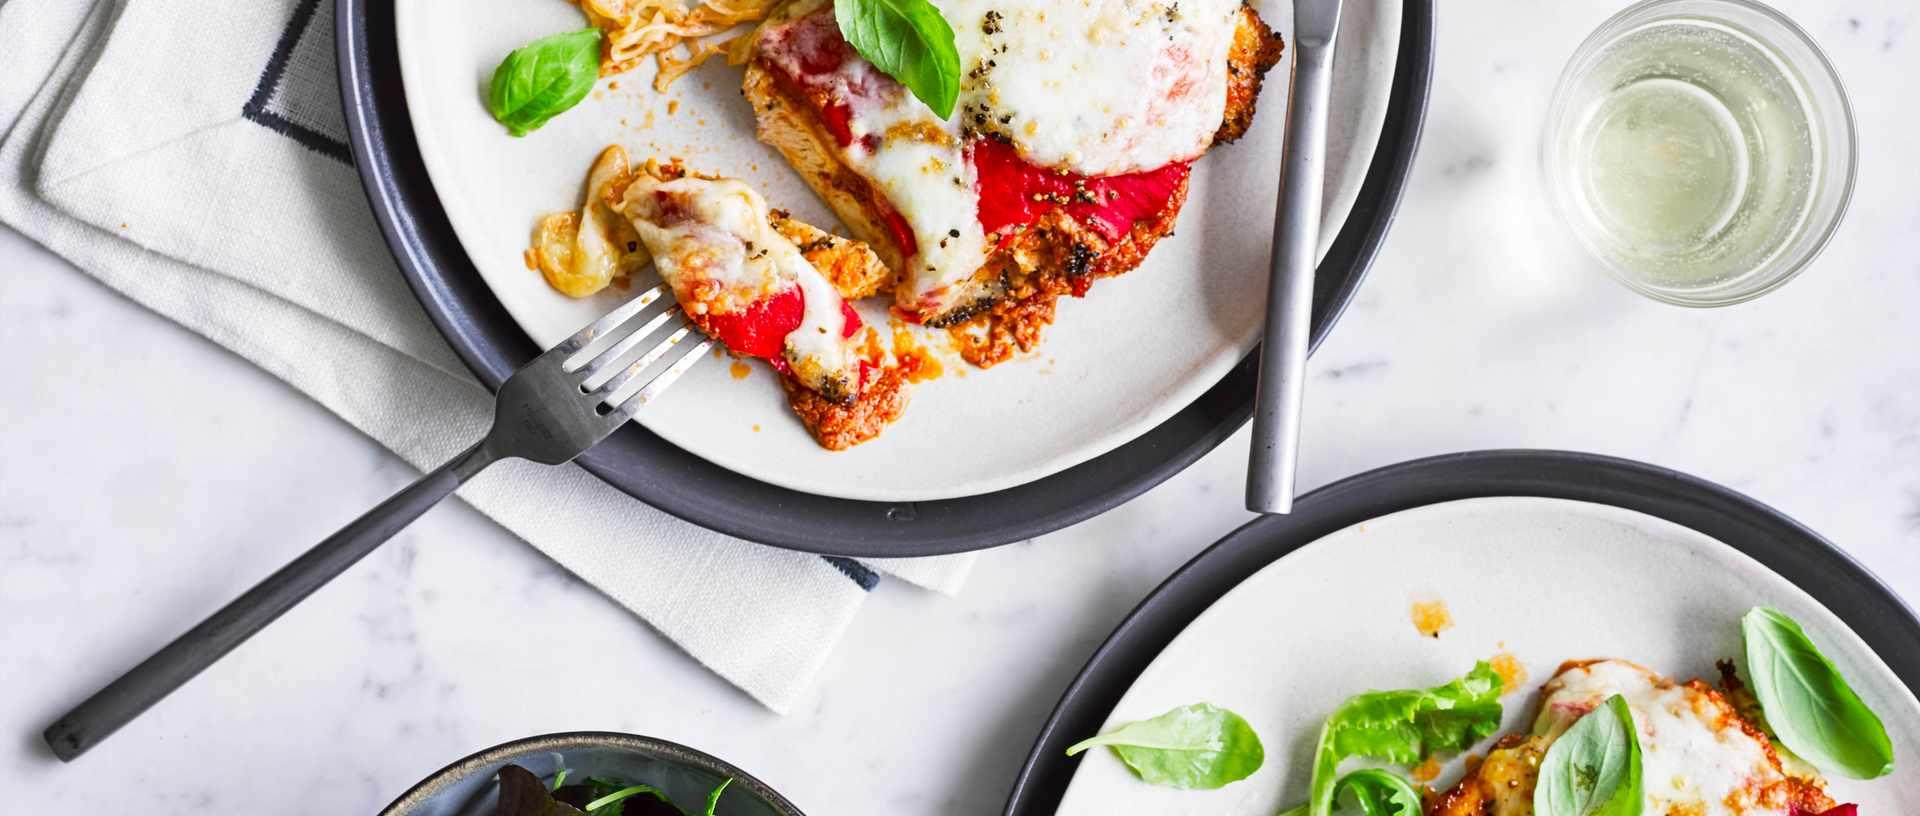 Chicken and red pesto melt